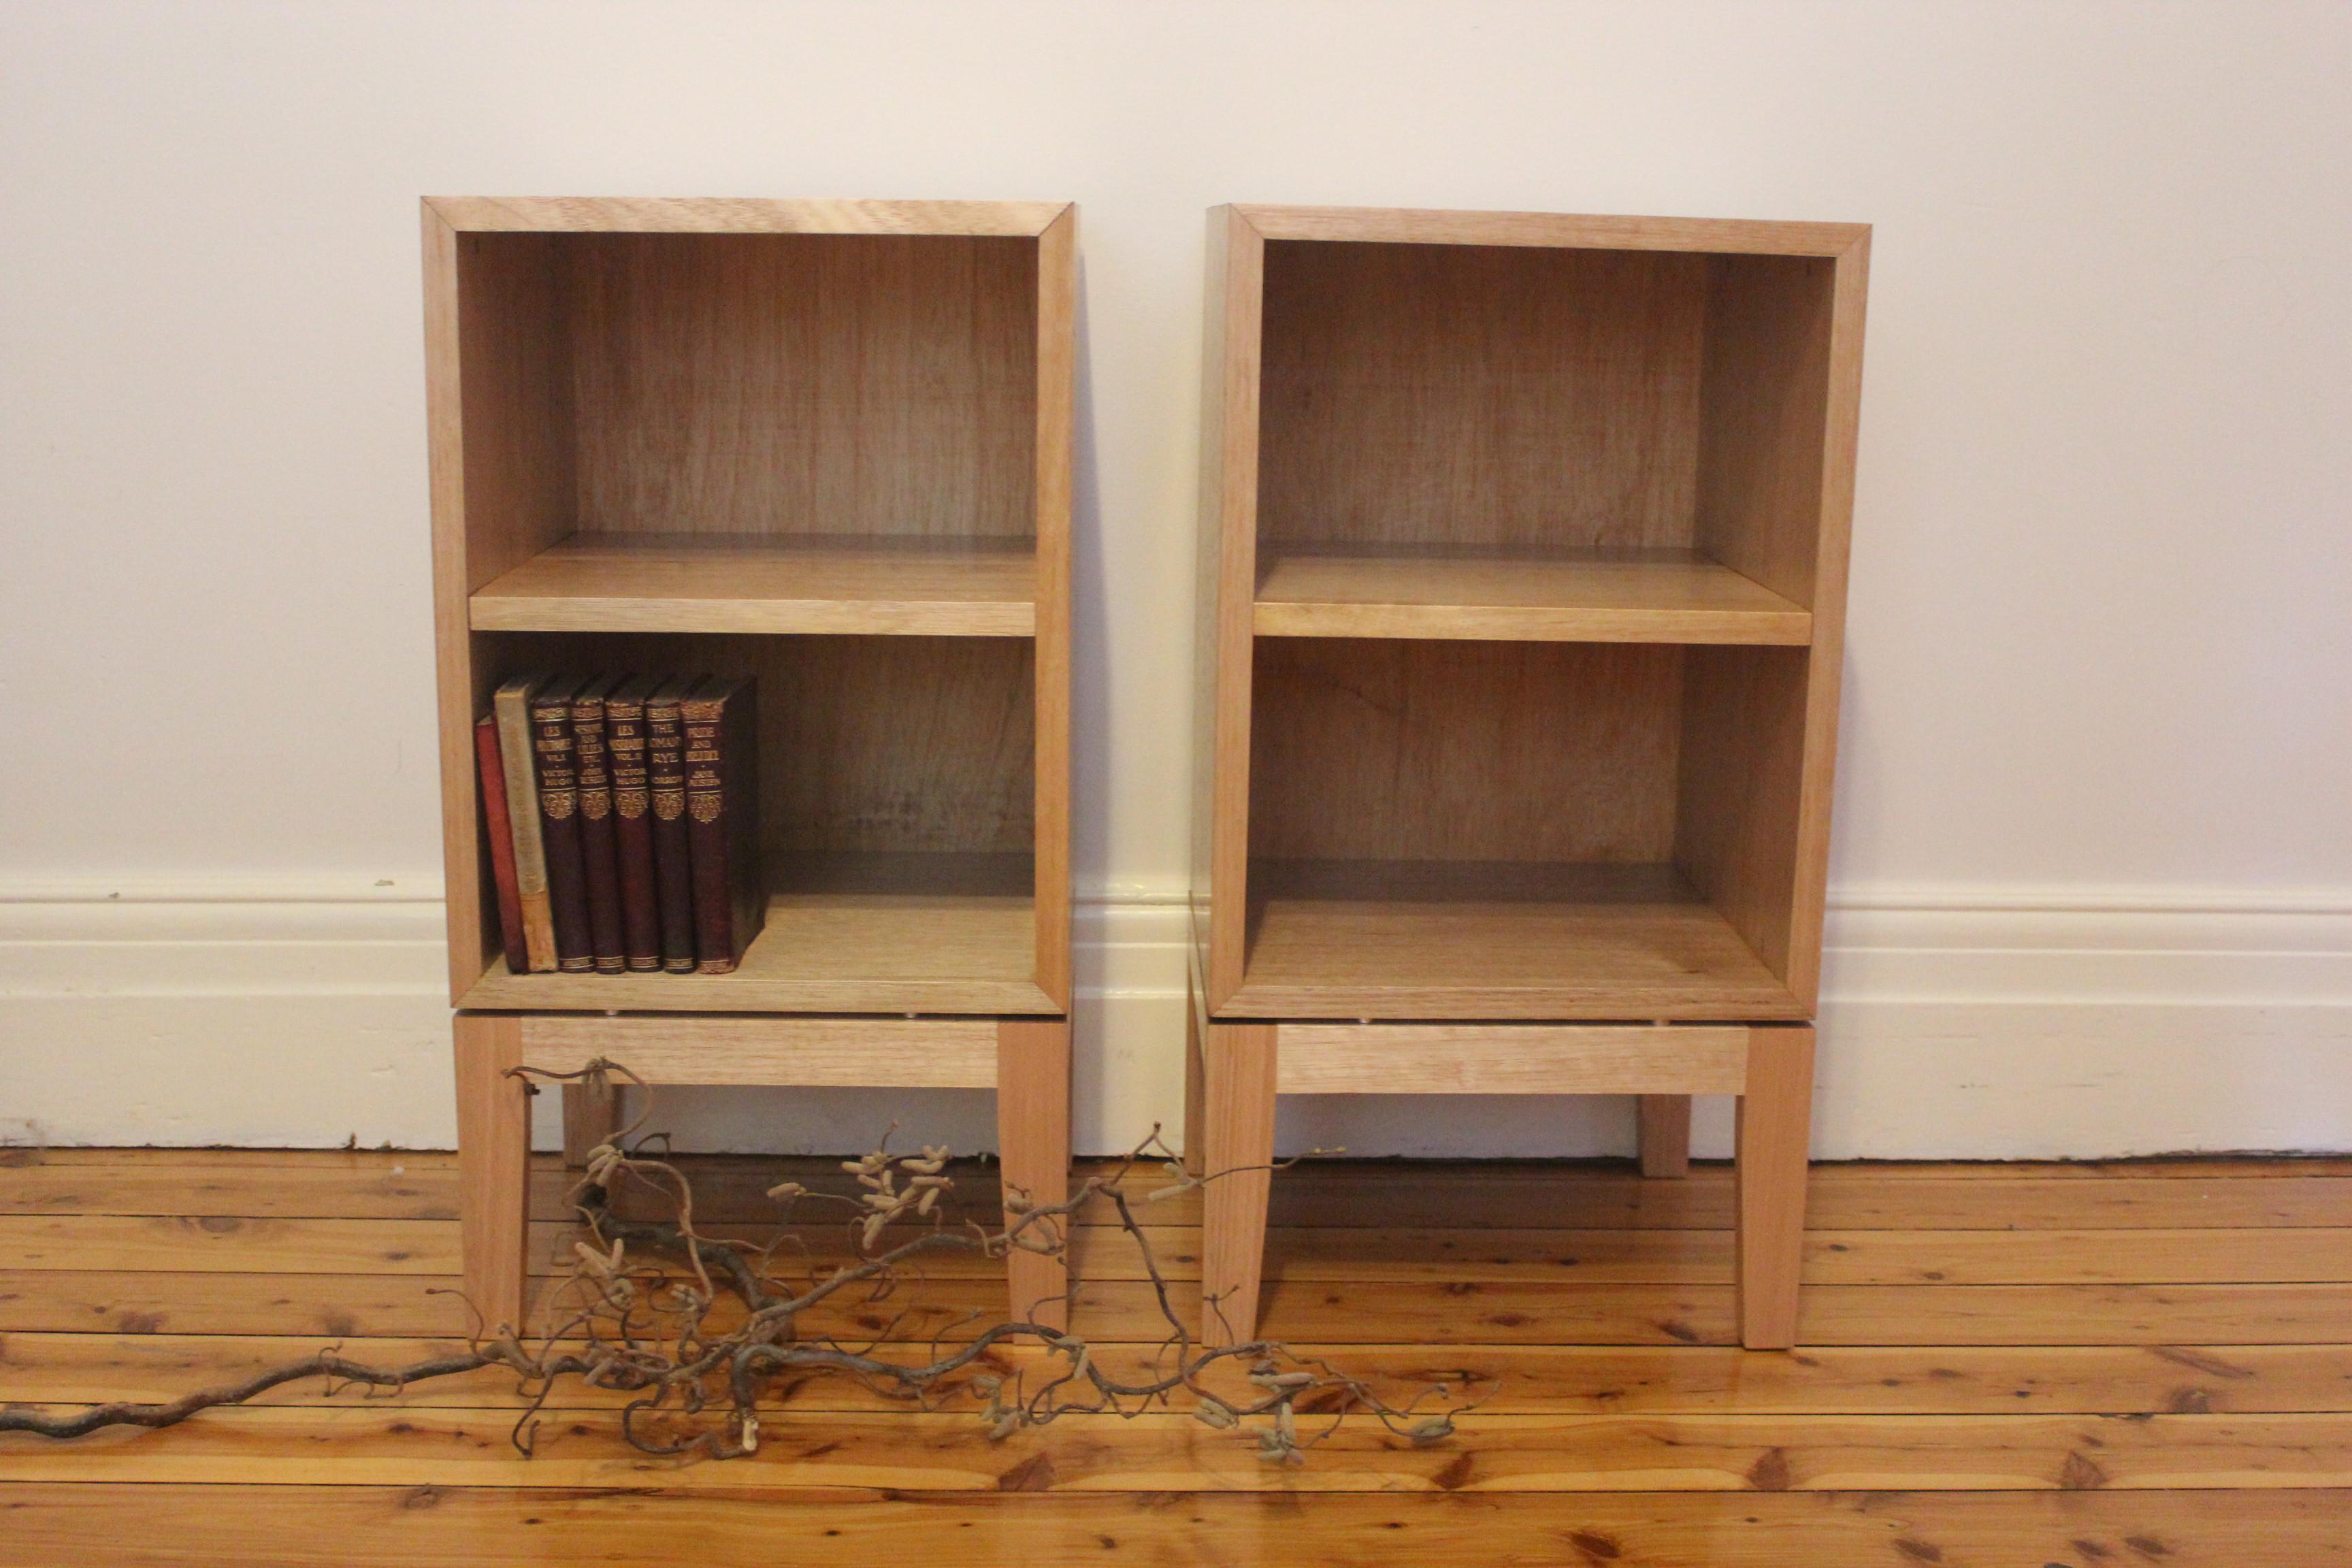 Consultative Advice for Furniture Design